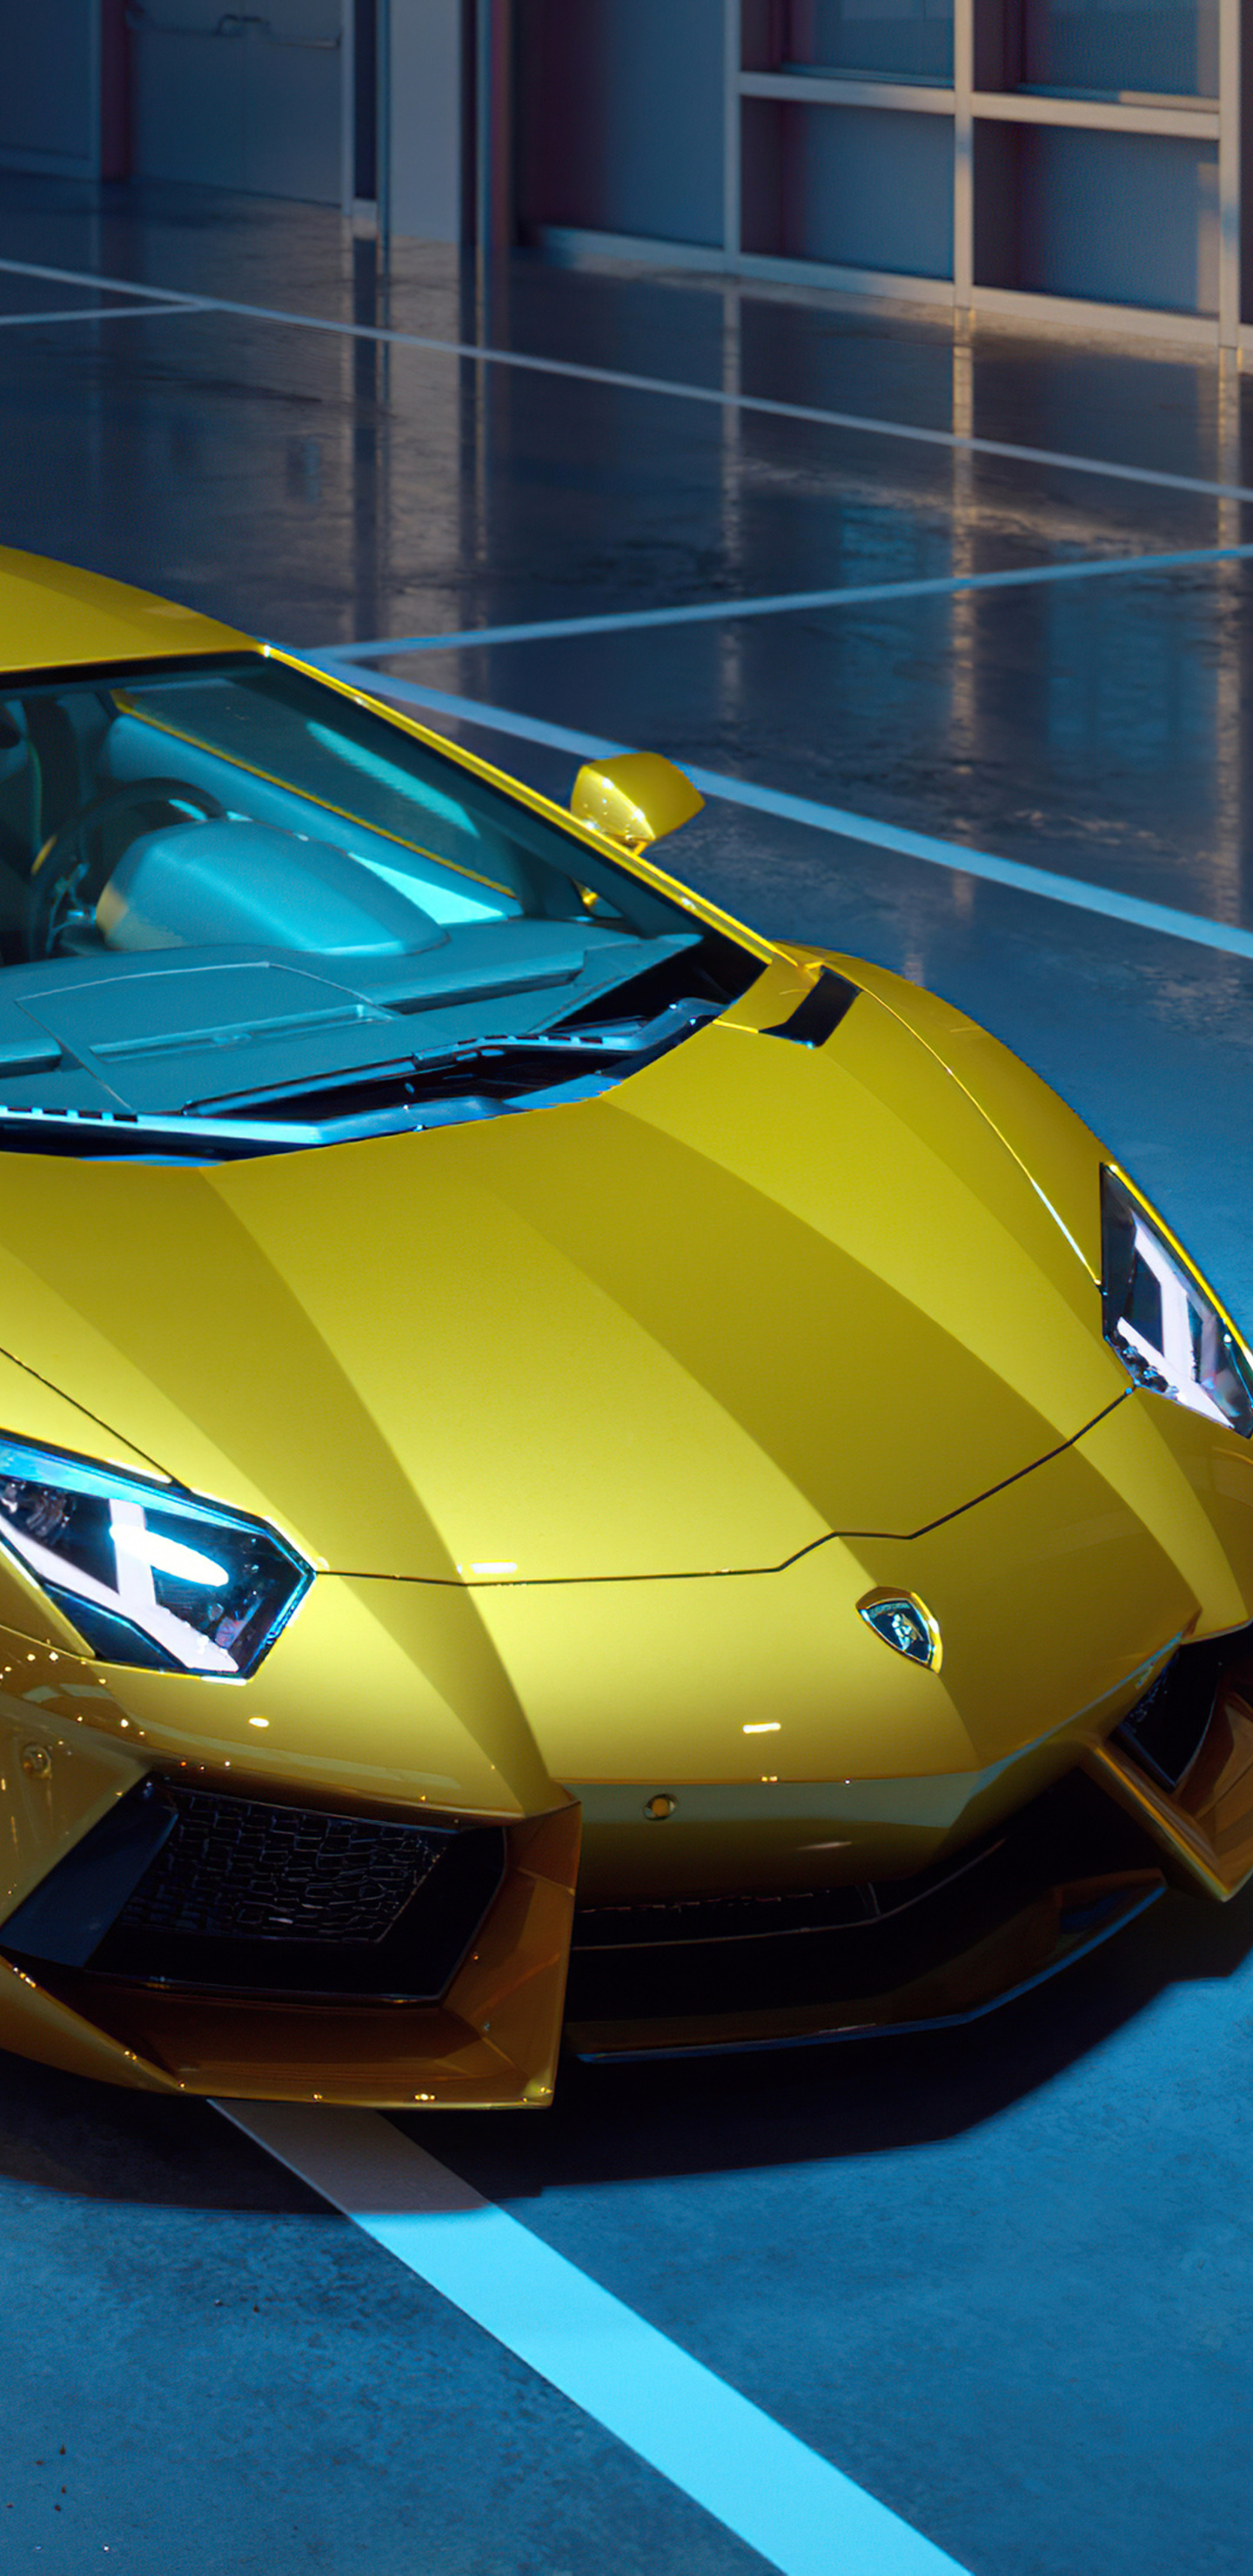 gold-lamborghini-aventador-dione-forged-4k-09.jpg